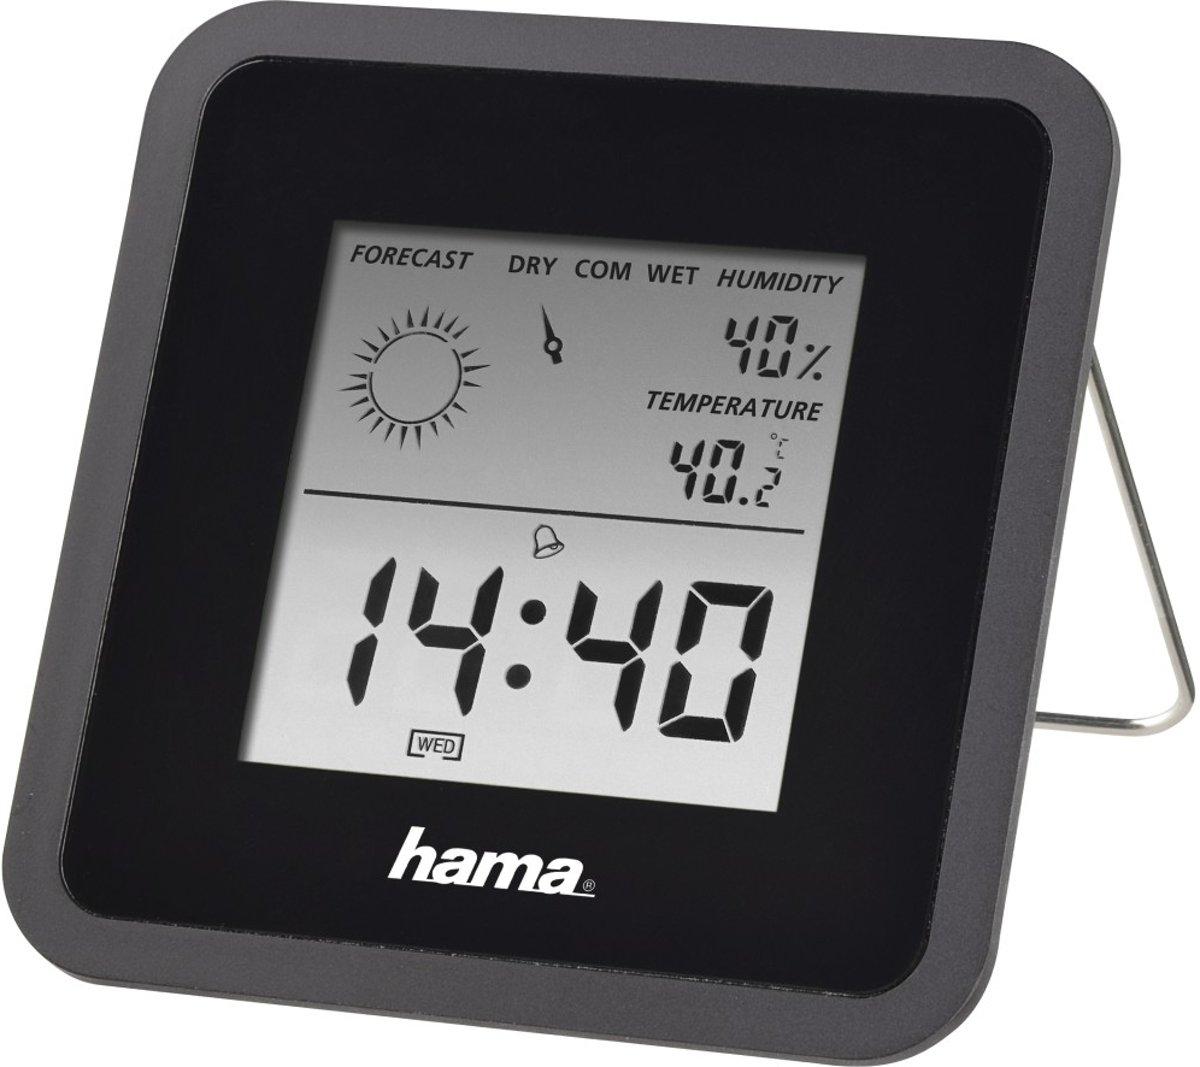 Hama Thermo-/hygrometer